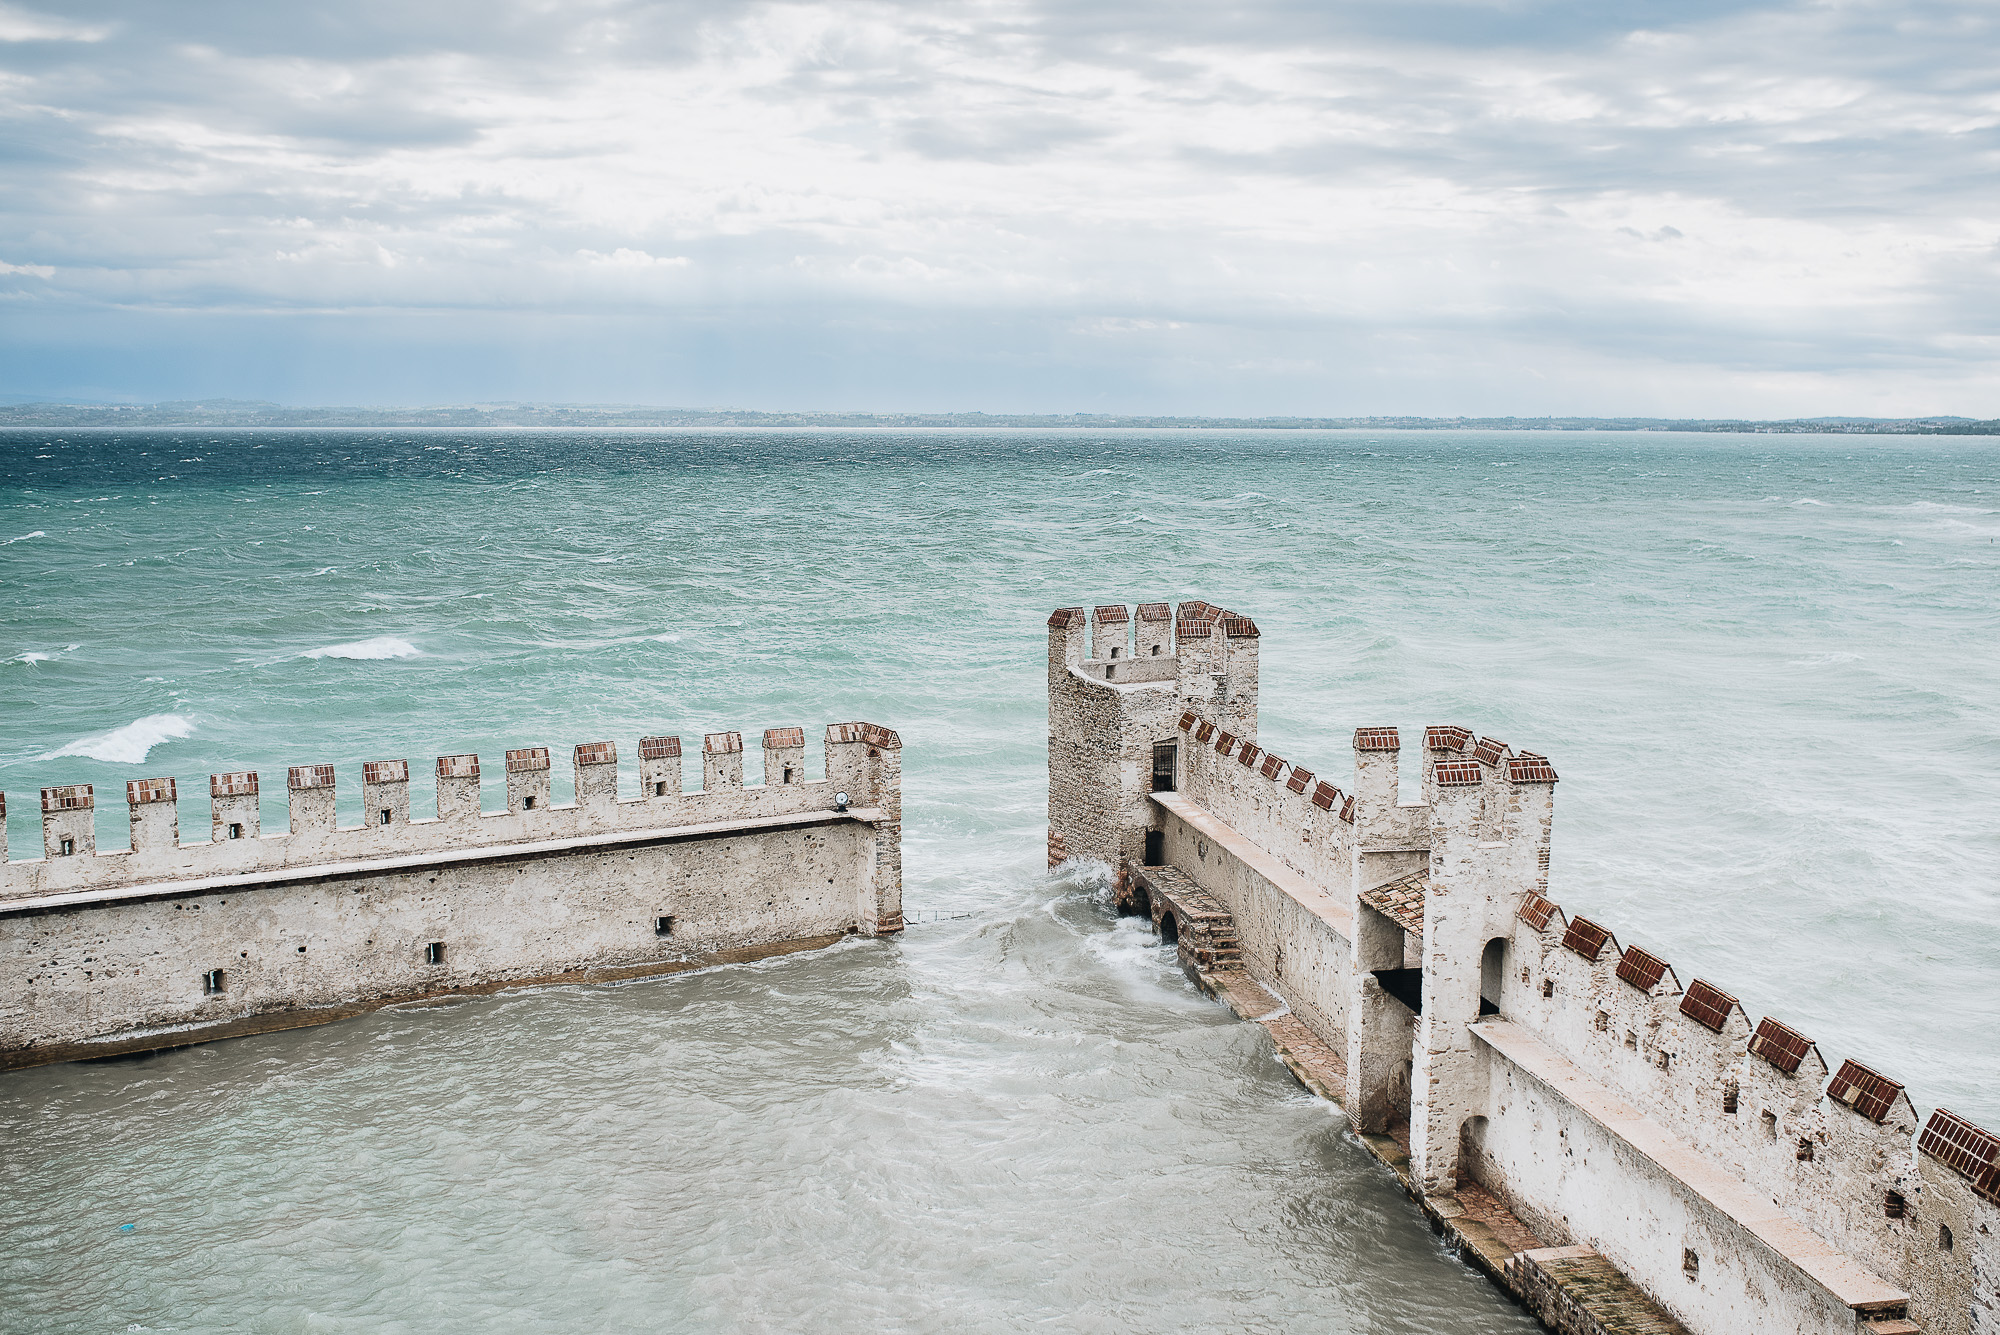 Lake Garda | Italy | Things to see and do blog | Photography